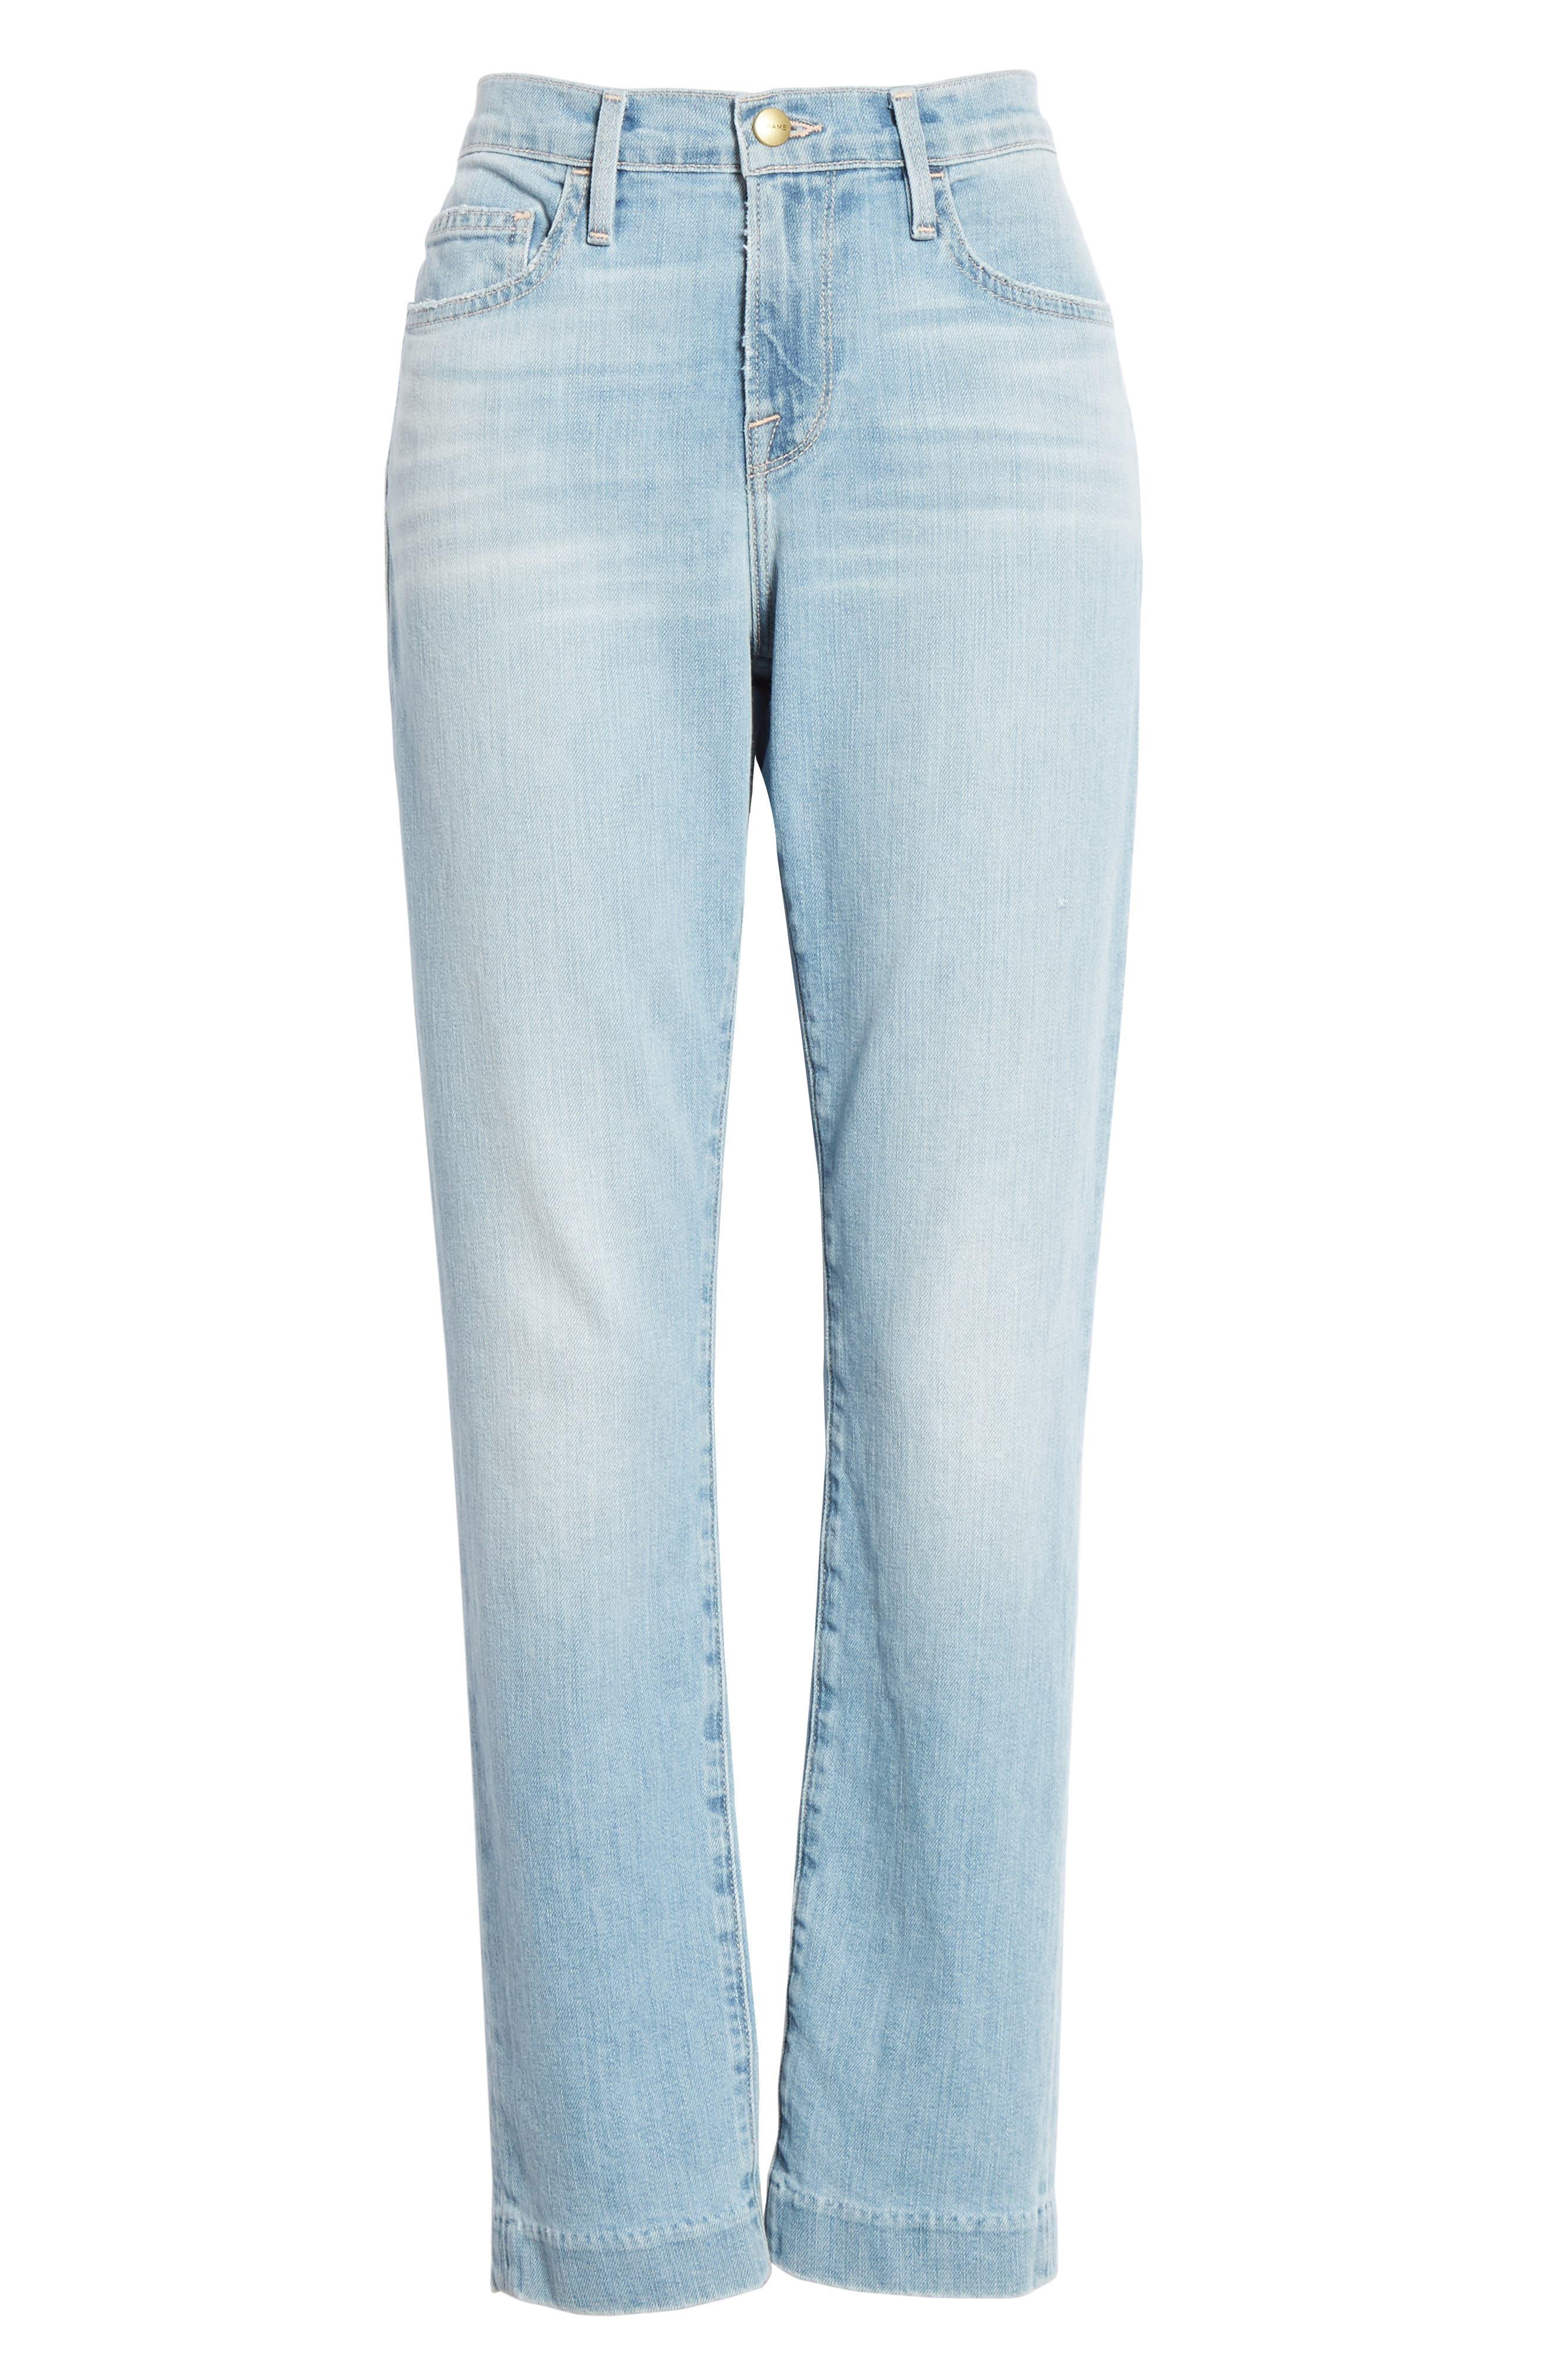 Le Boy High Waist Jeans,                             Alternate thumbnail 6, color,                             KEATON